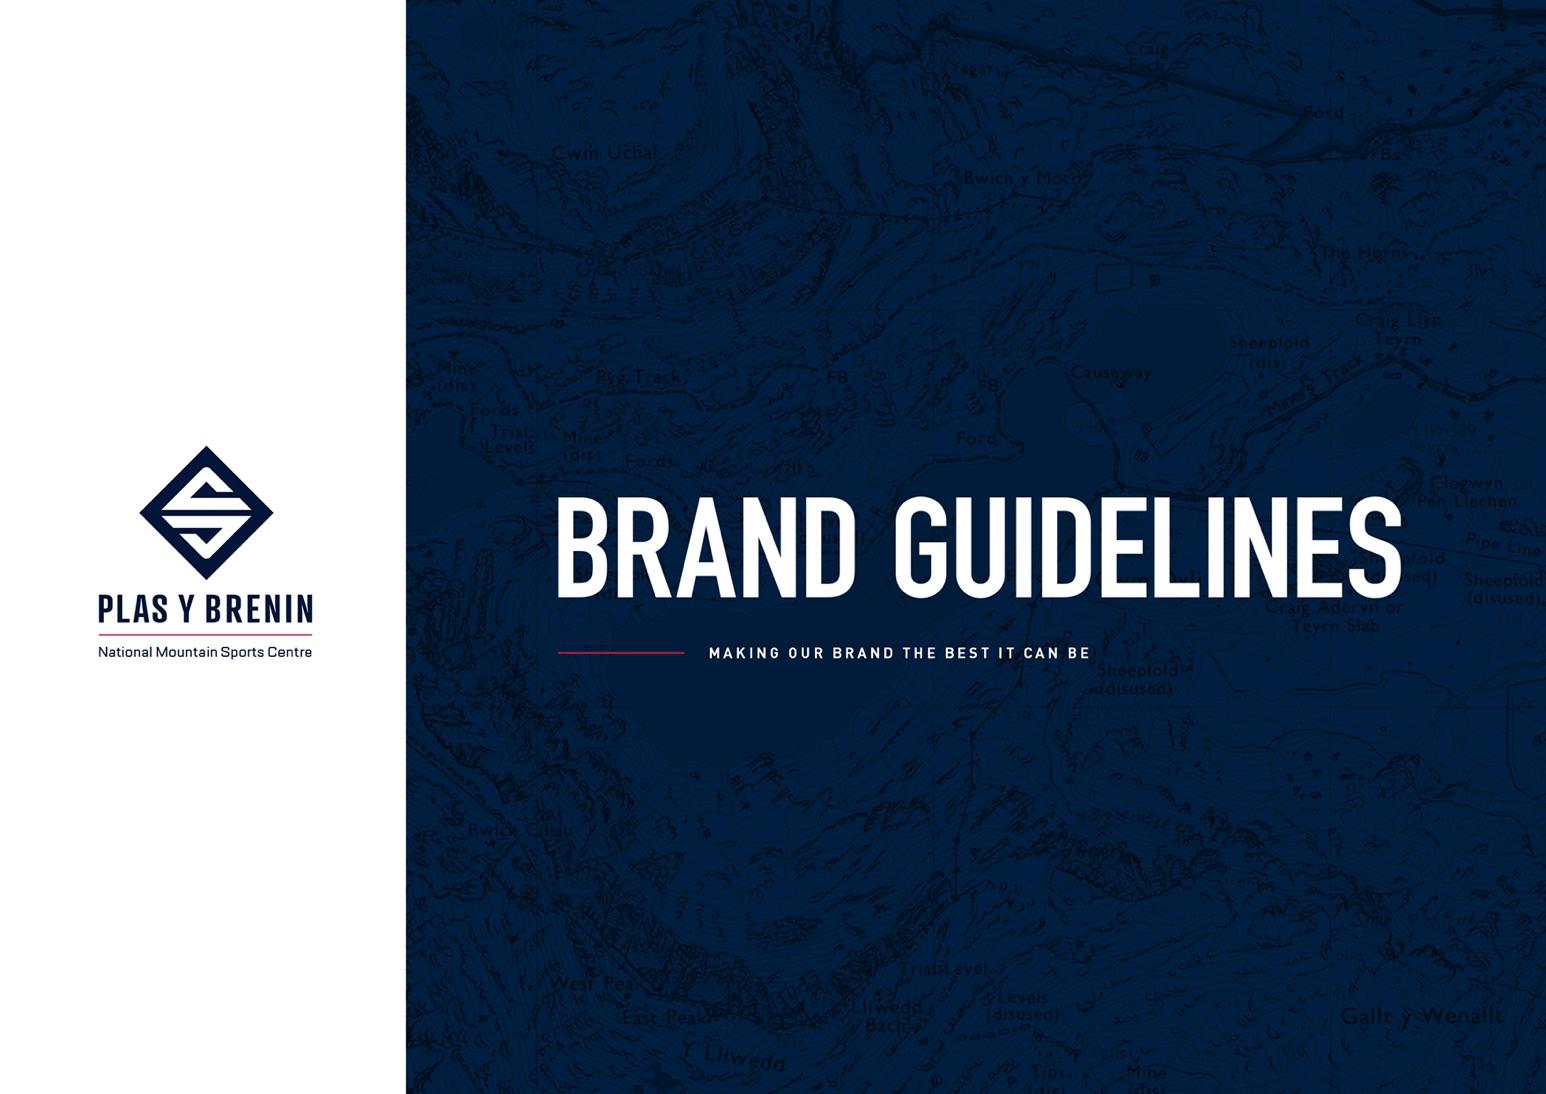 Plas Y Brenin (PYB) Brand Guidelines